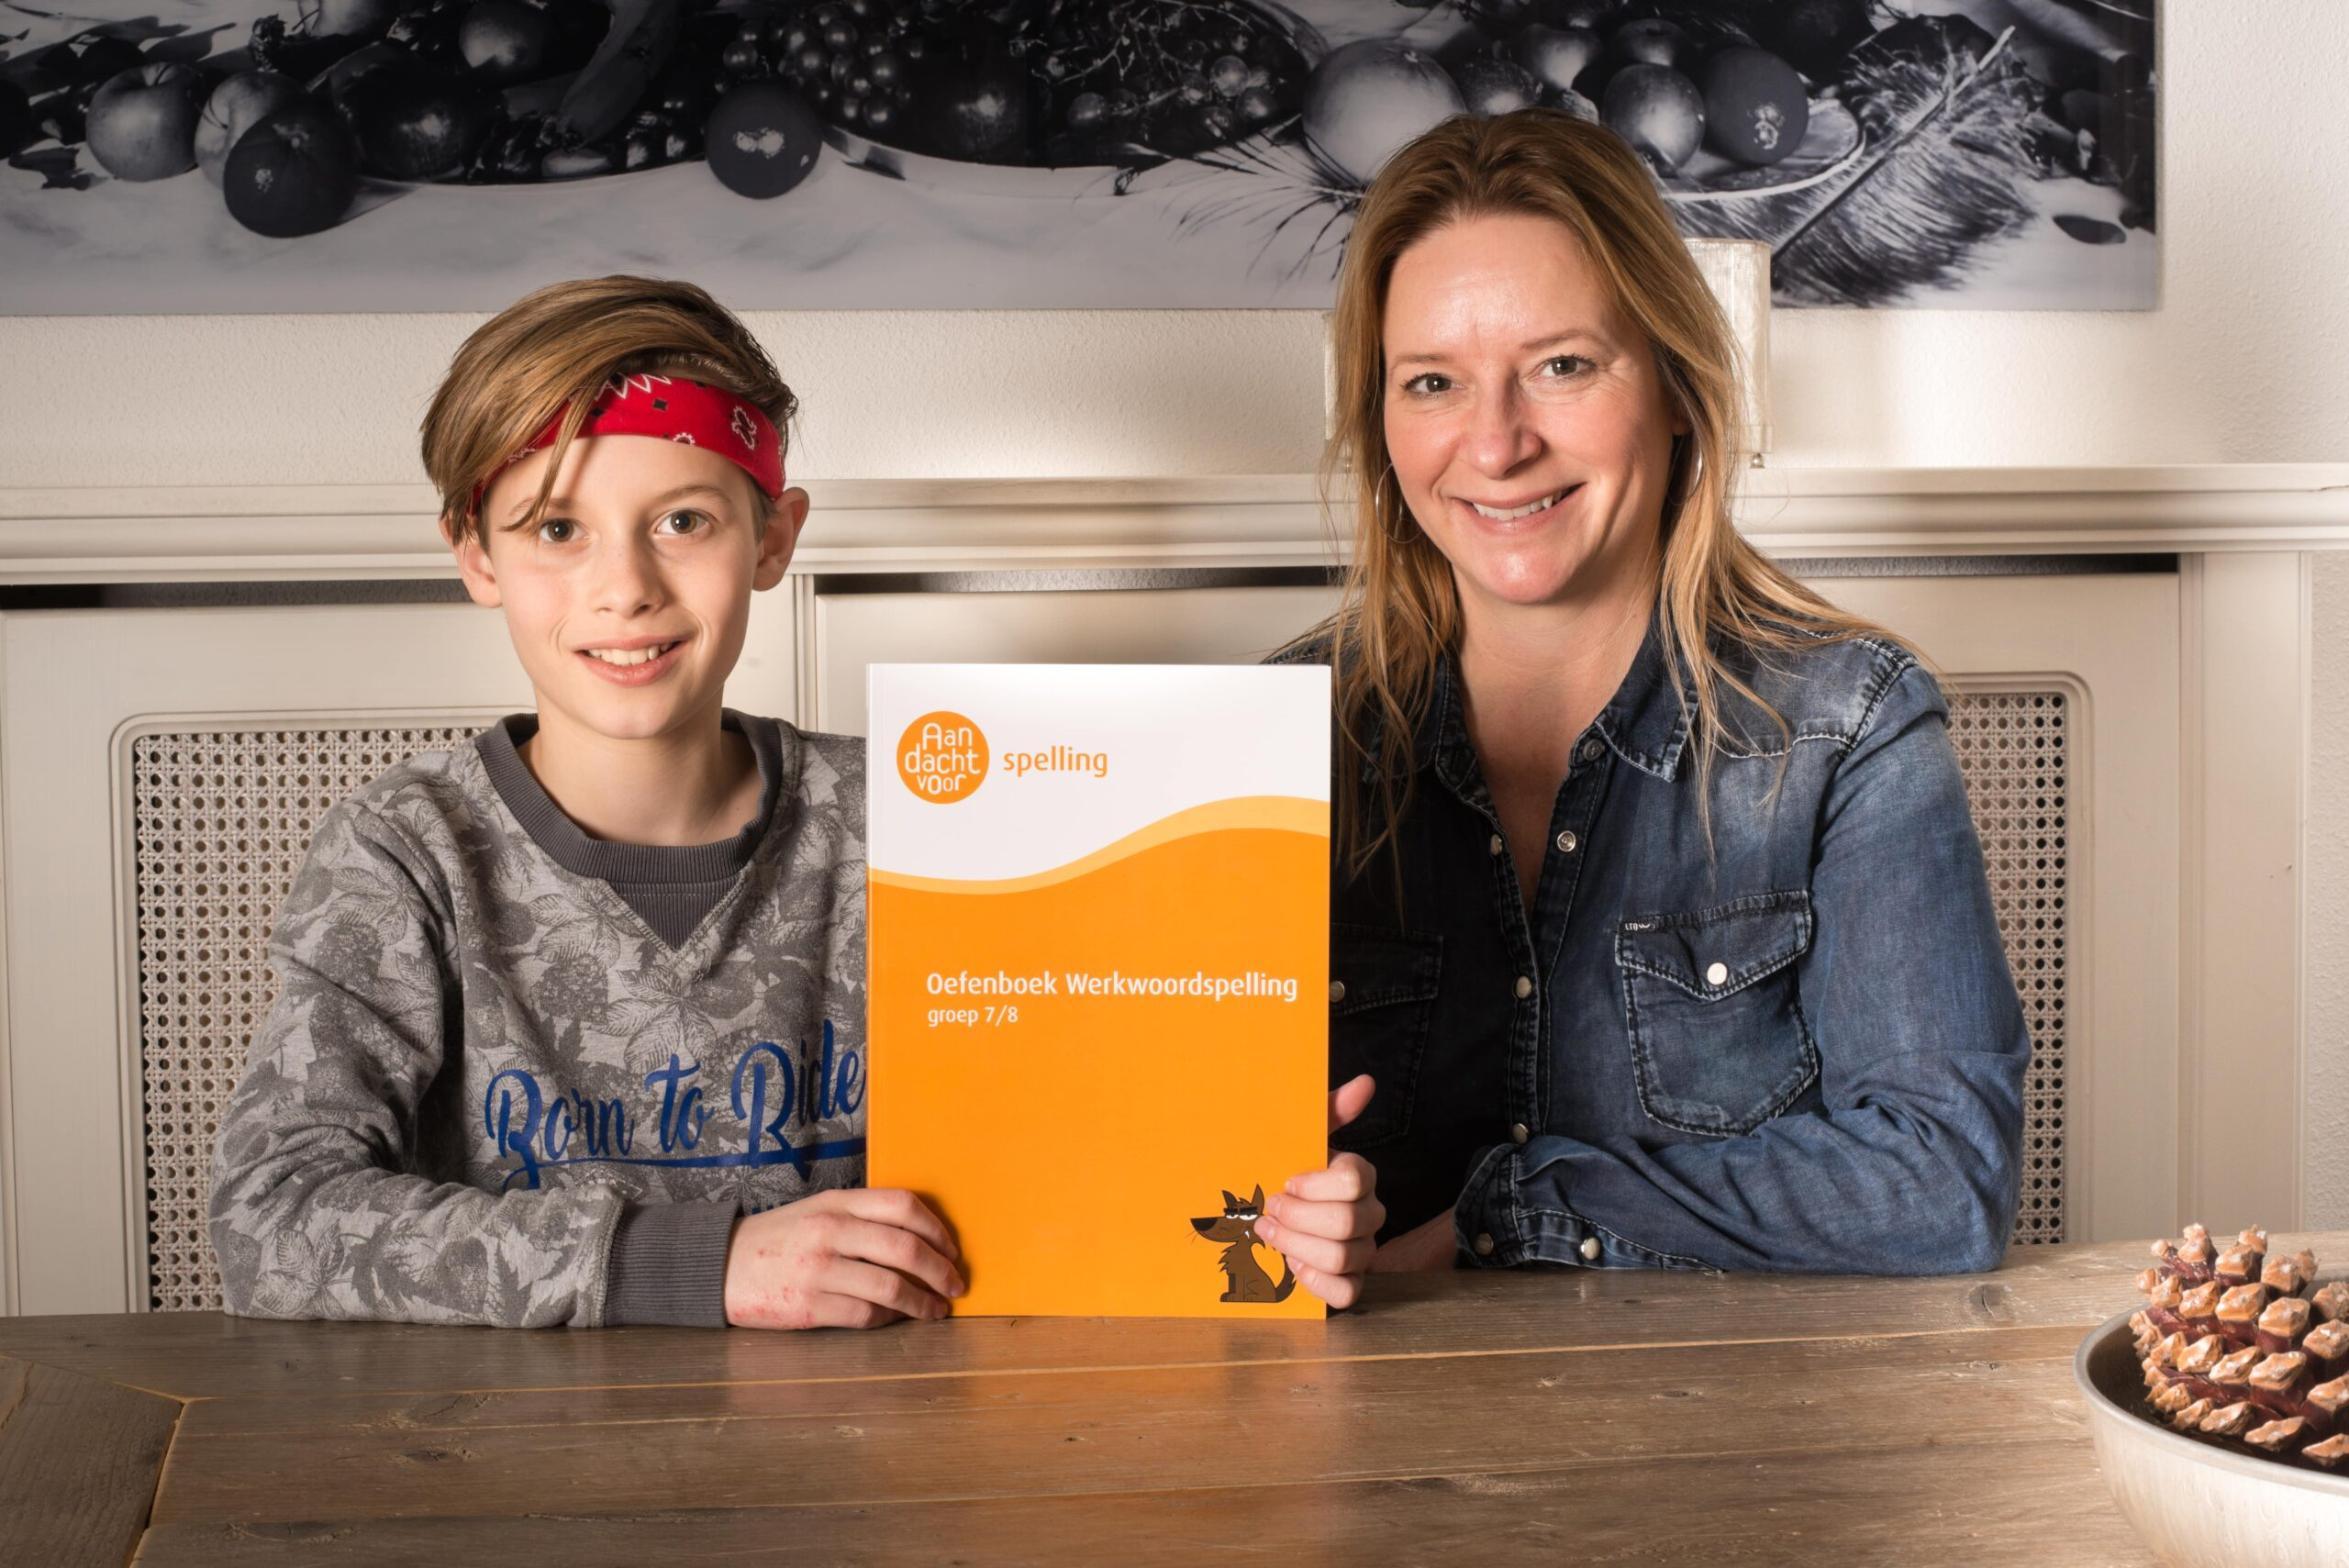 moeder en zoon met boek werkwoordspelling